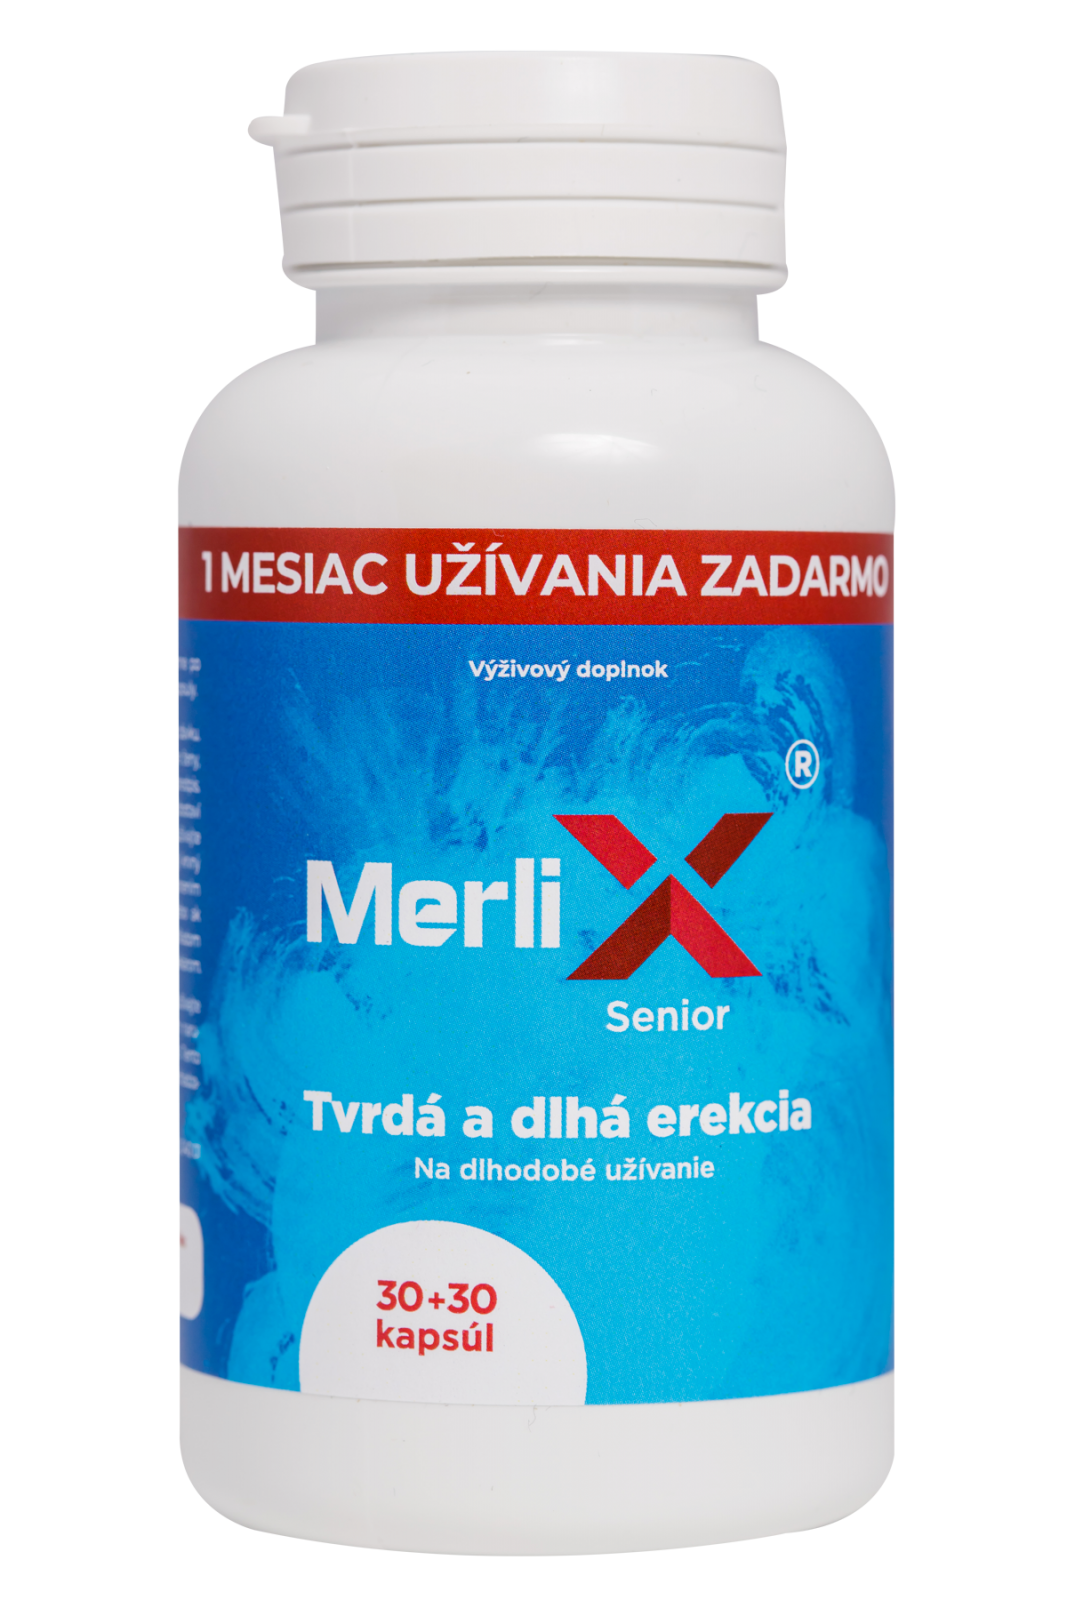 MerliX Senior